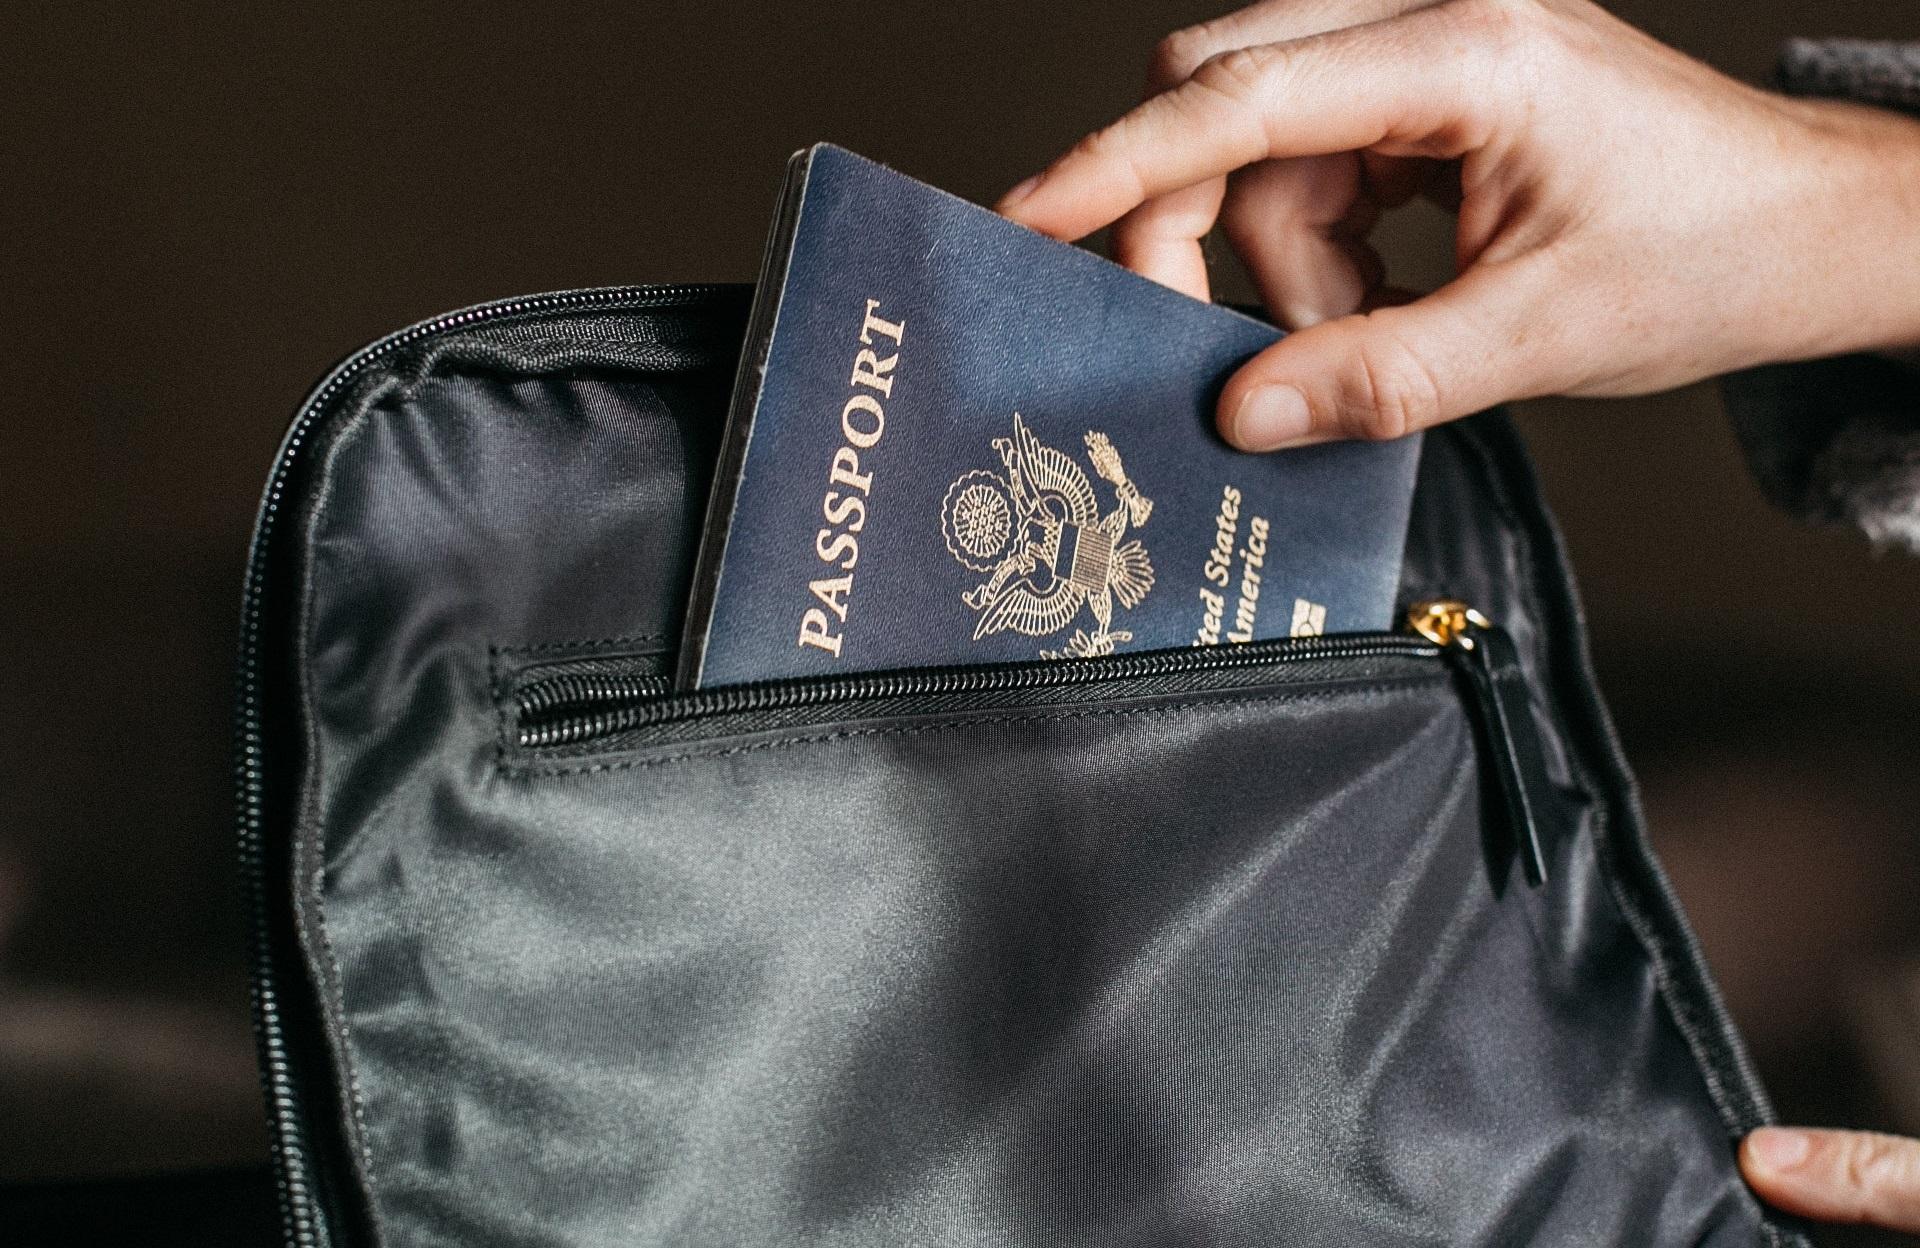 Photo_placing passport in bag